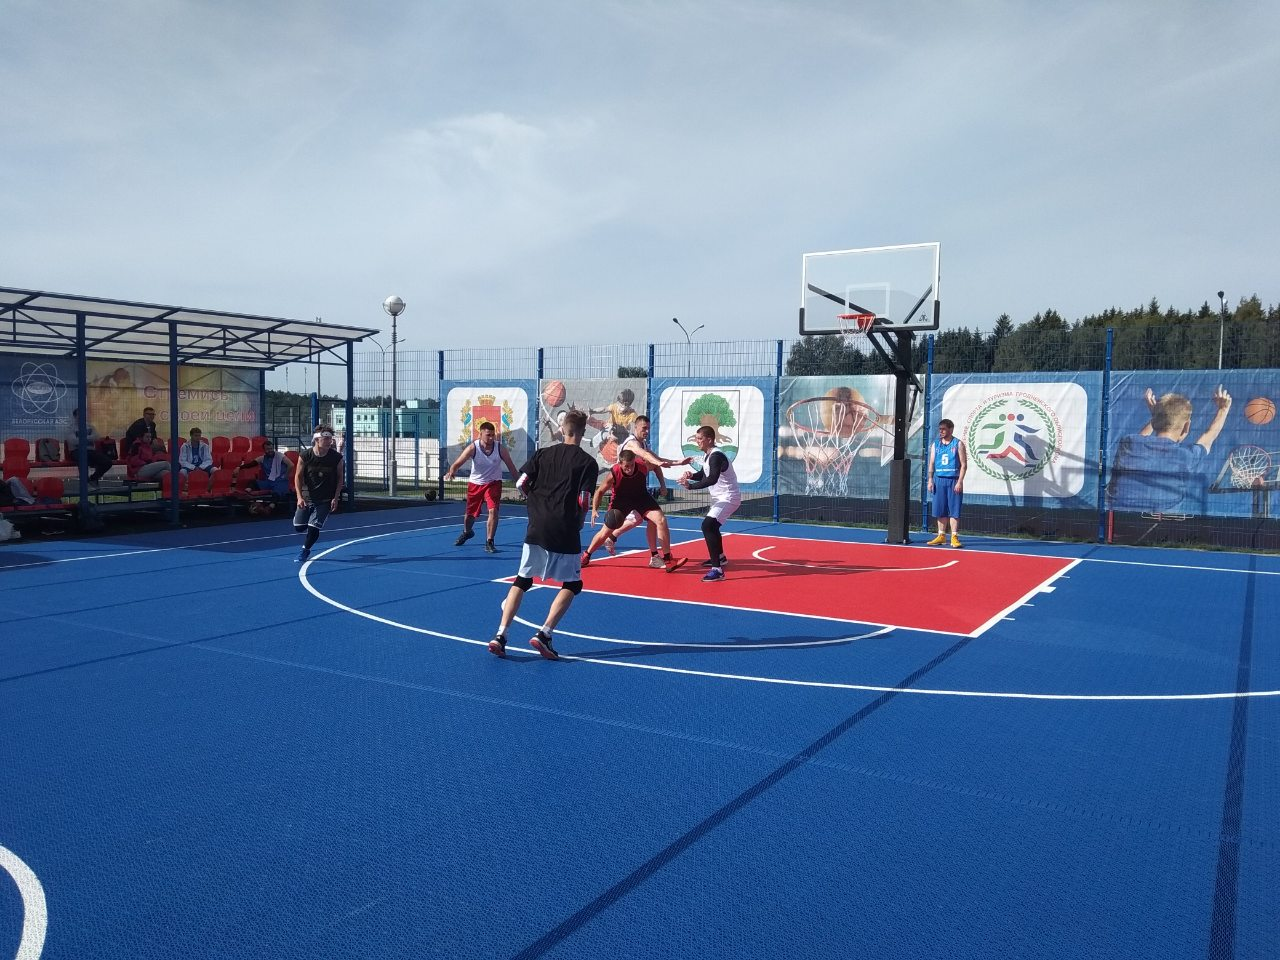 Результаты открытого турнира по баскетболу 3х3 «Планета баскетбола - Оранжевый Атом».